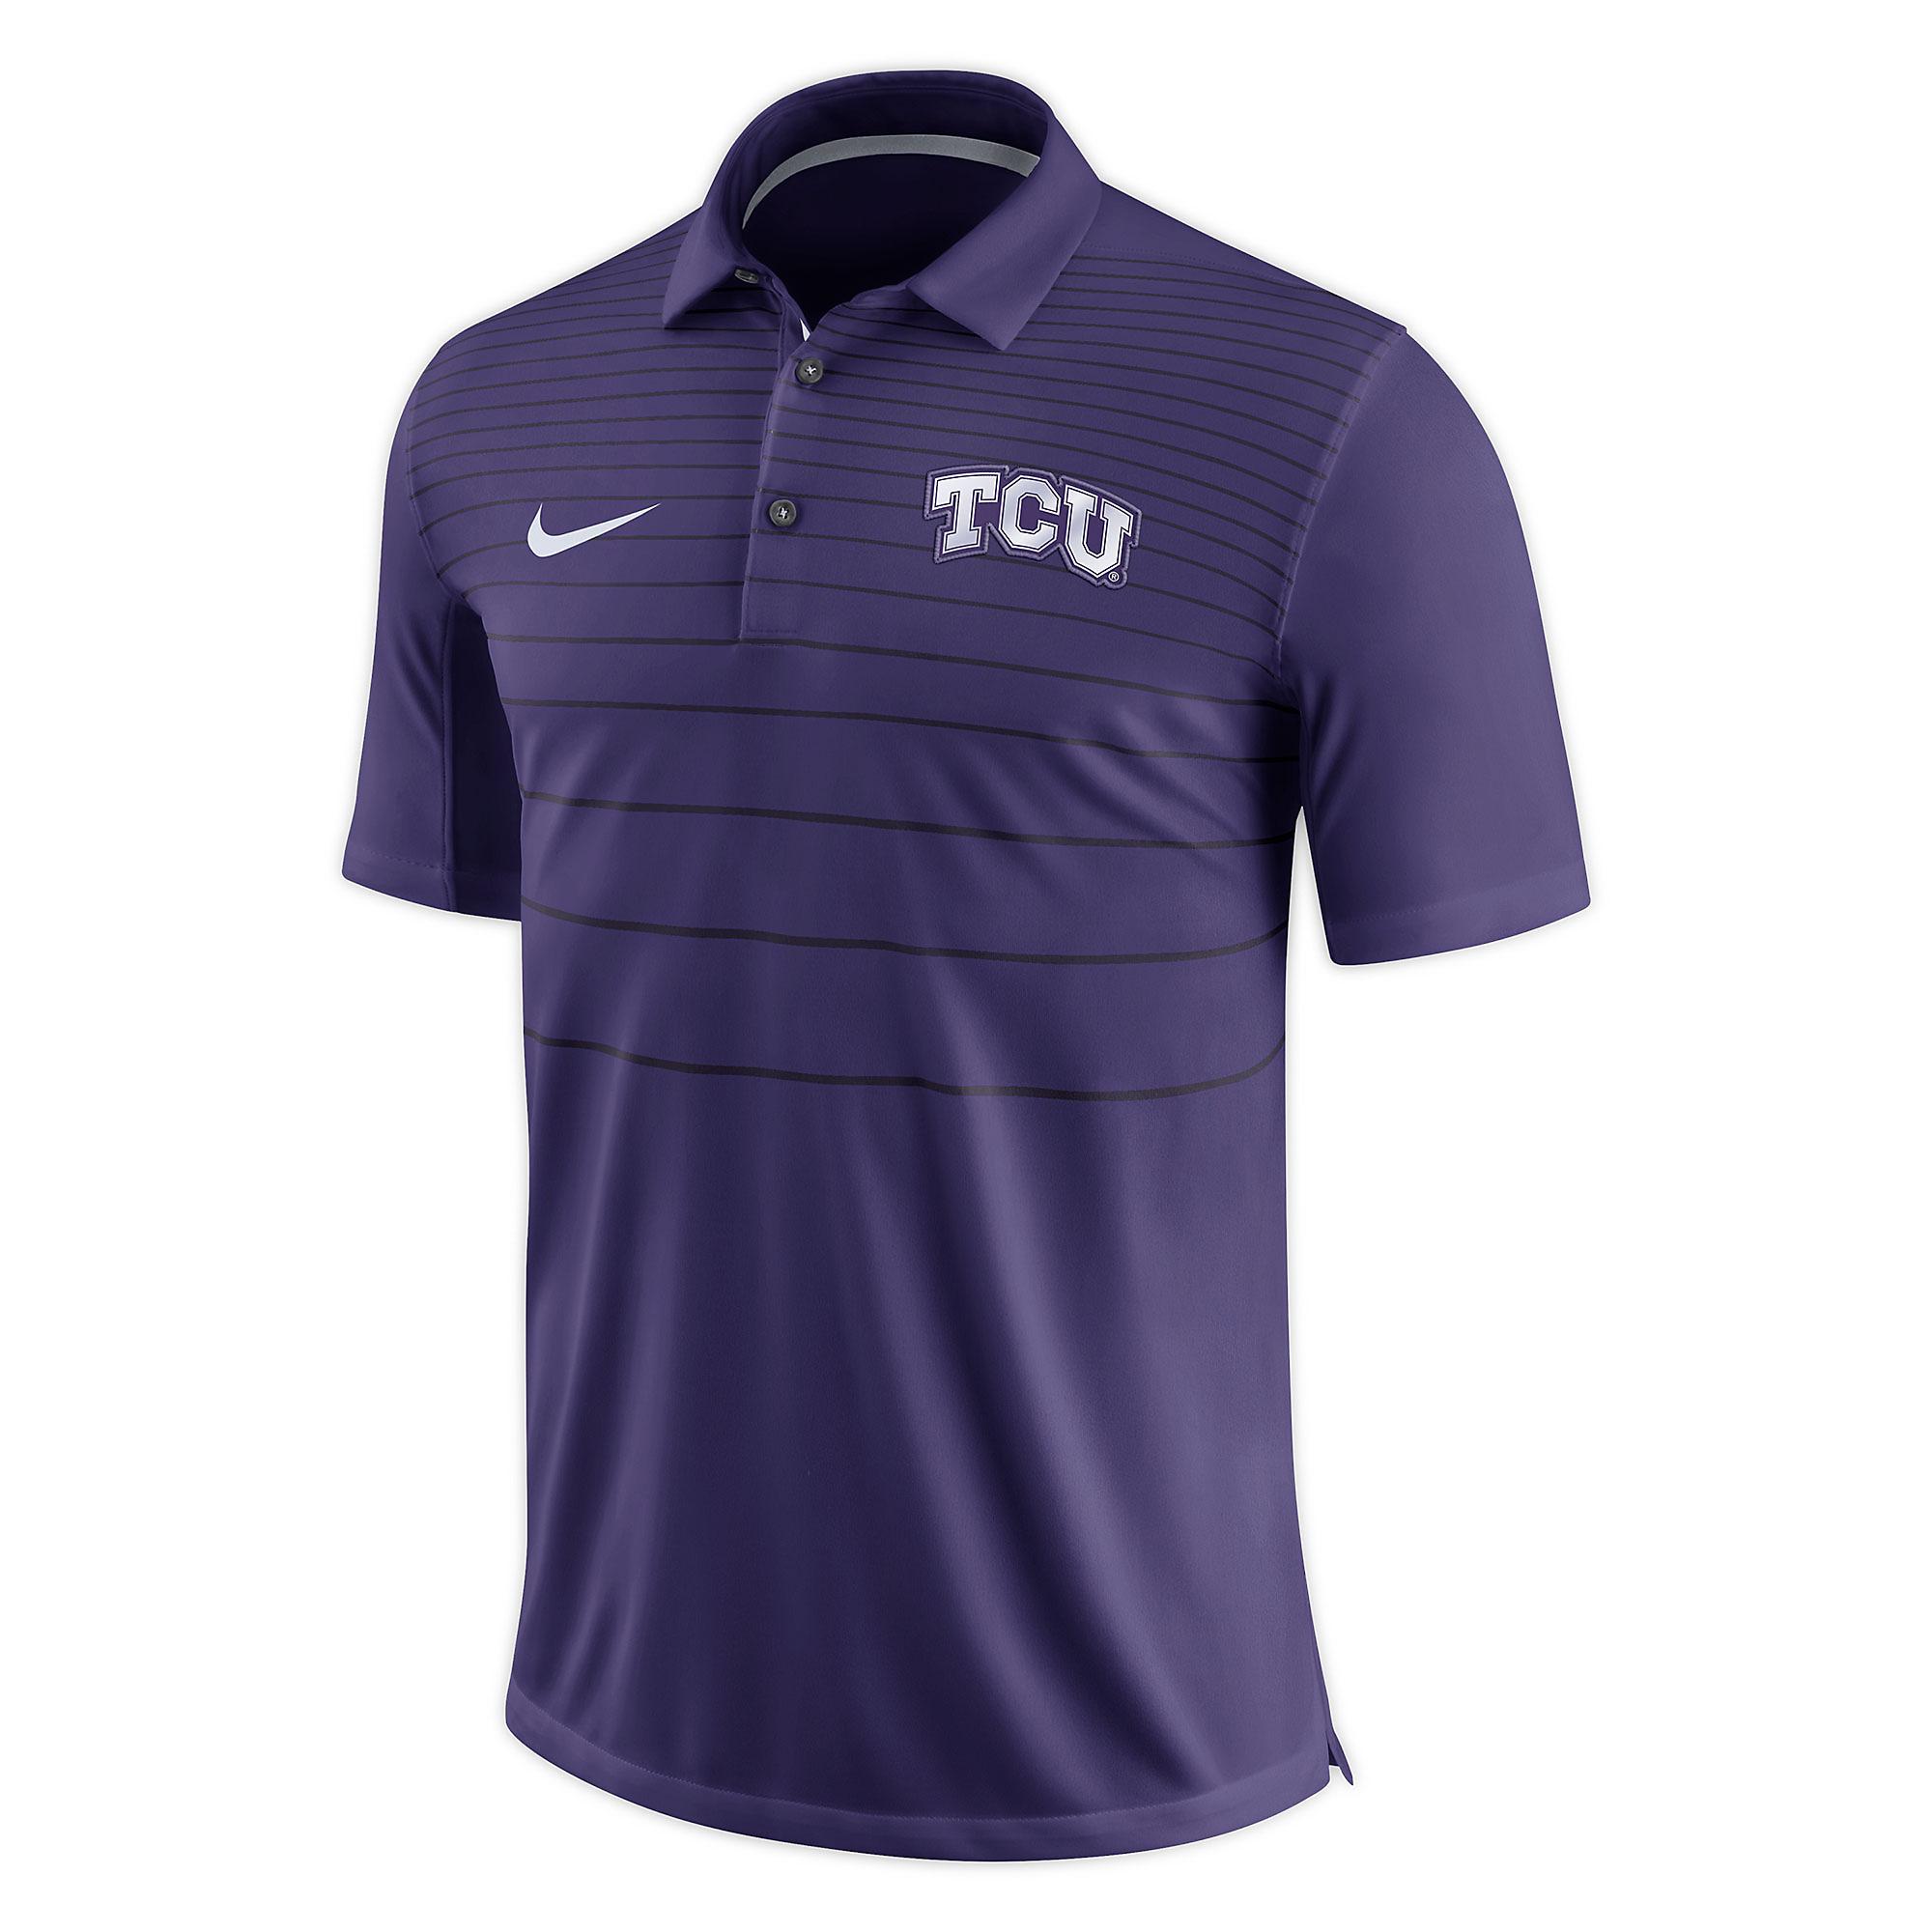 TCU Horned Frogs Nike Early Season Short Sleeve Polo